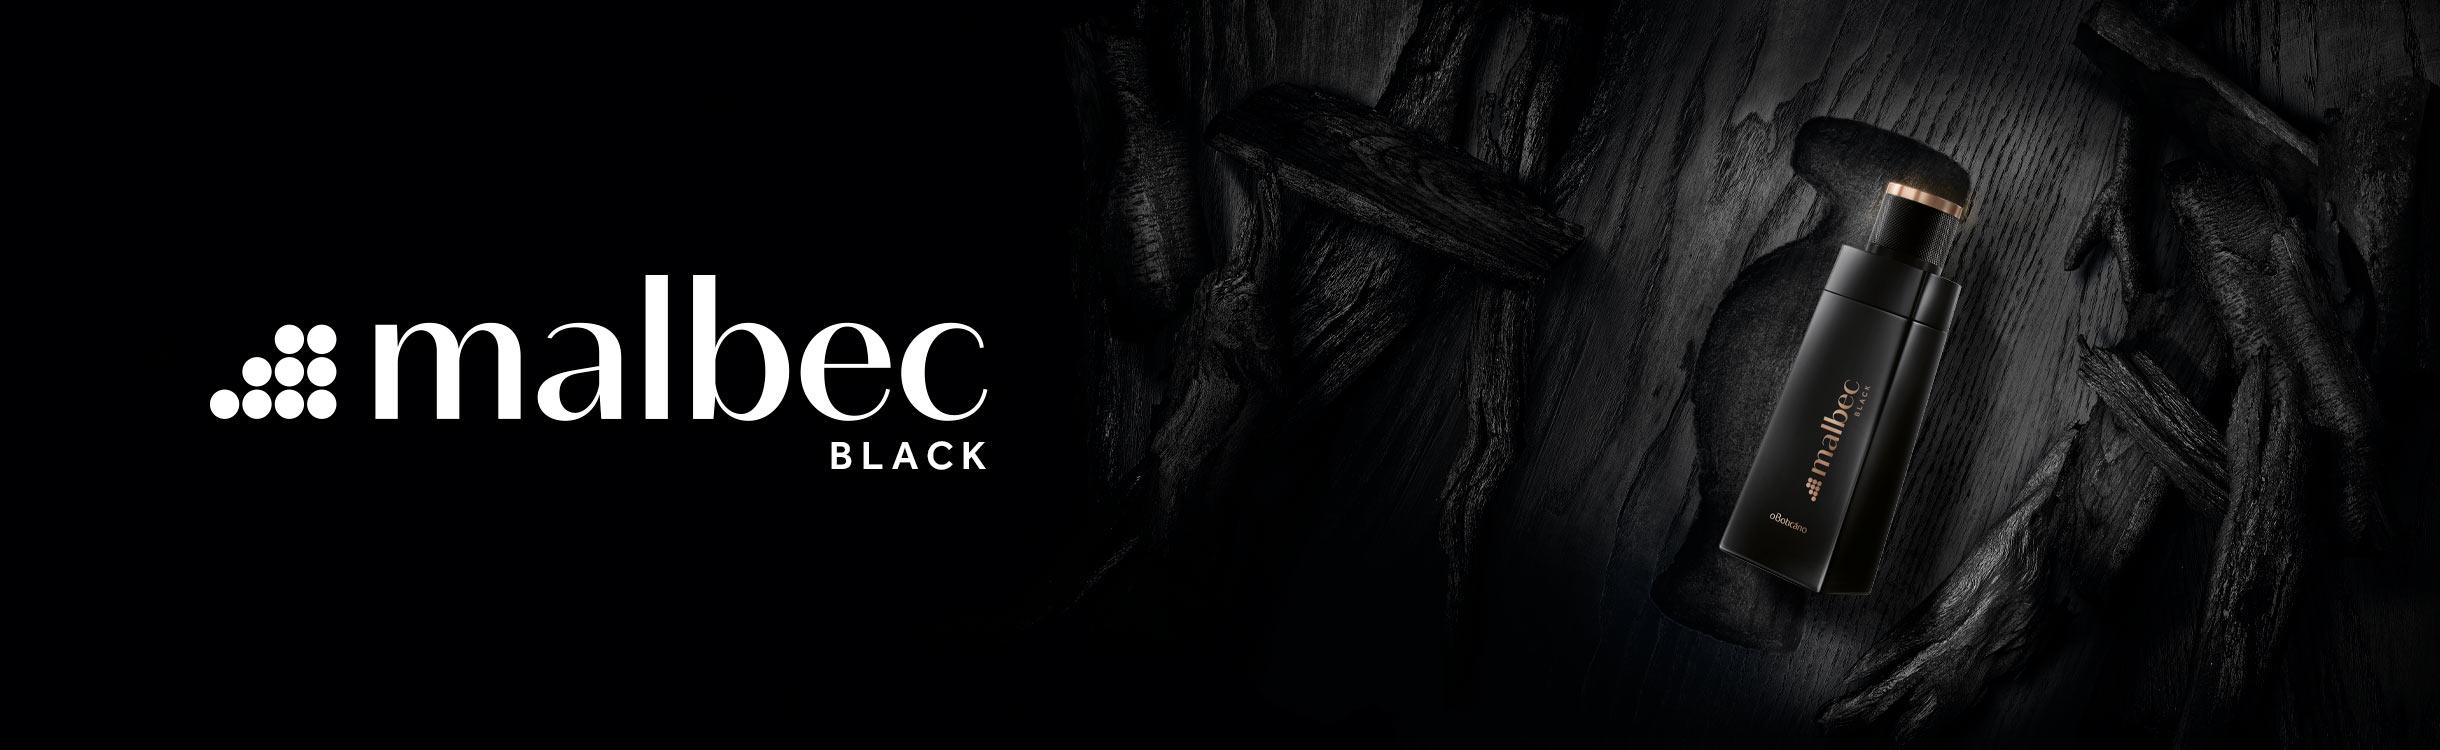 Malbec Black